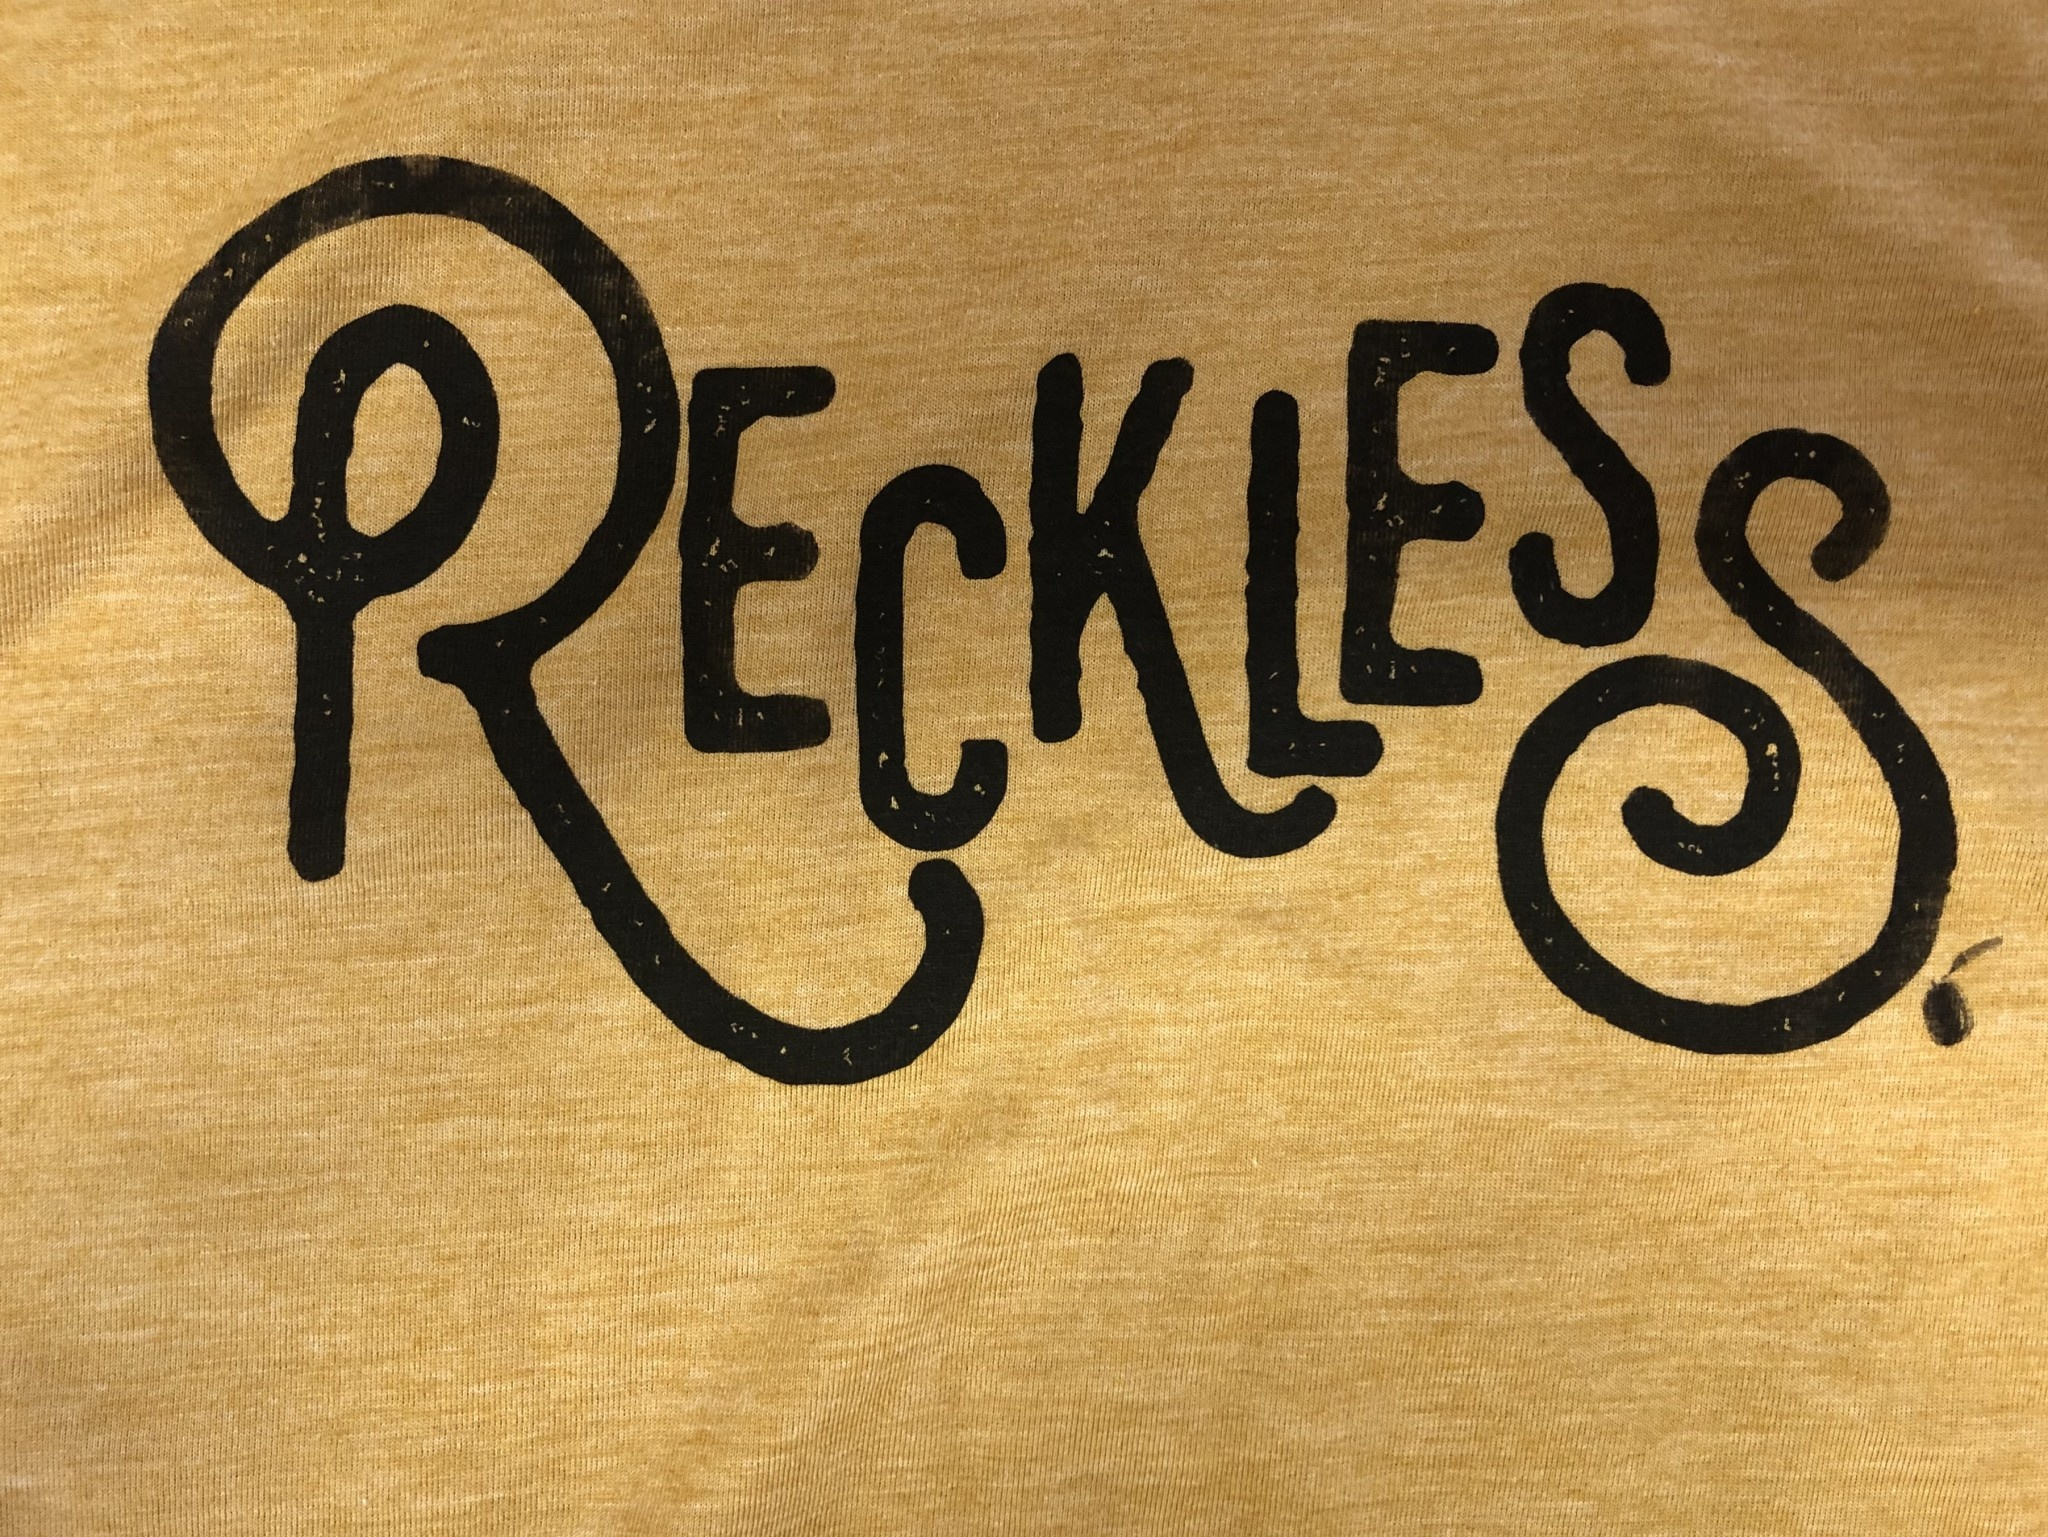 Reckless w/ Cut Hemline Tee